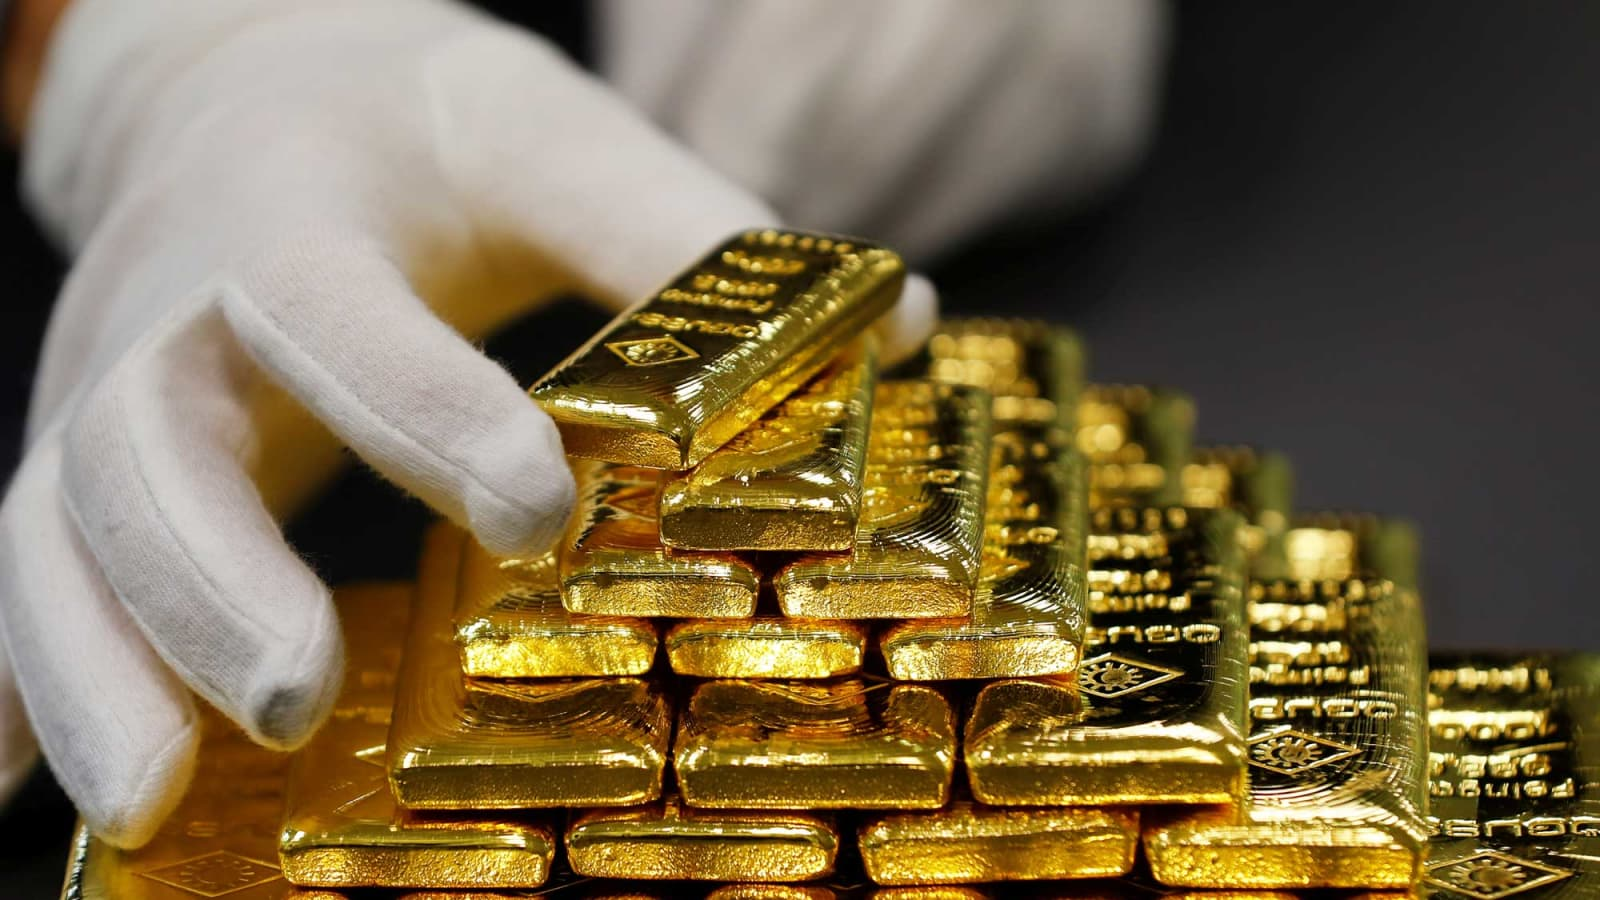 104902147-RTX3SM45-gold